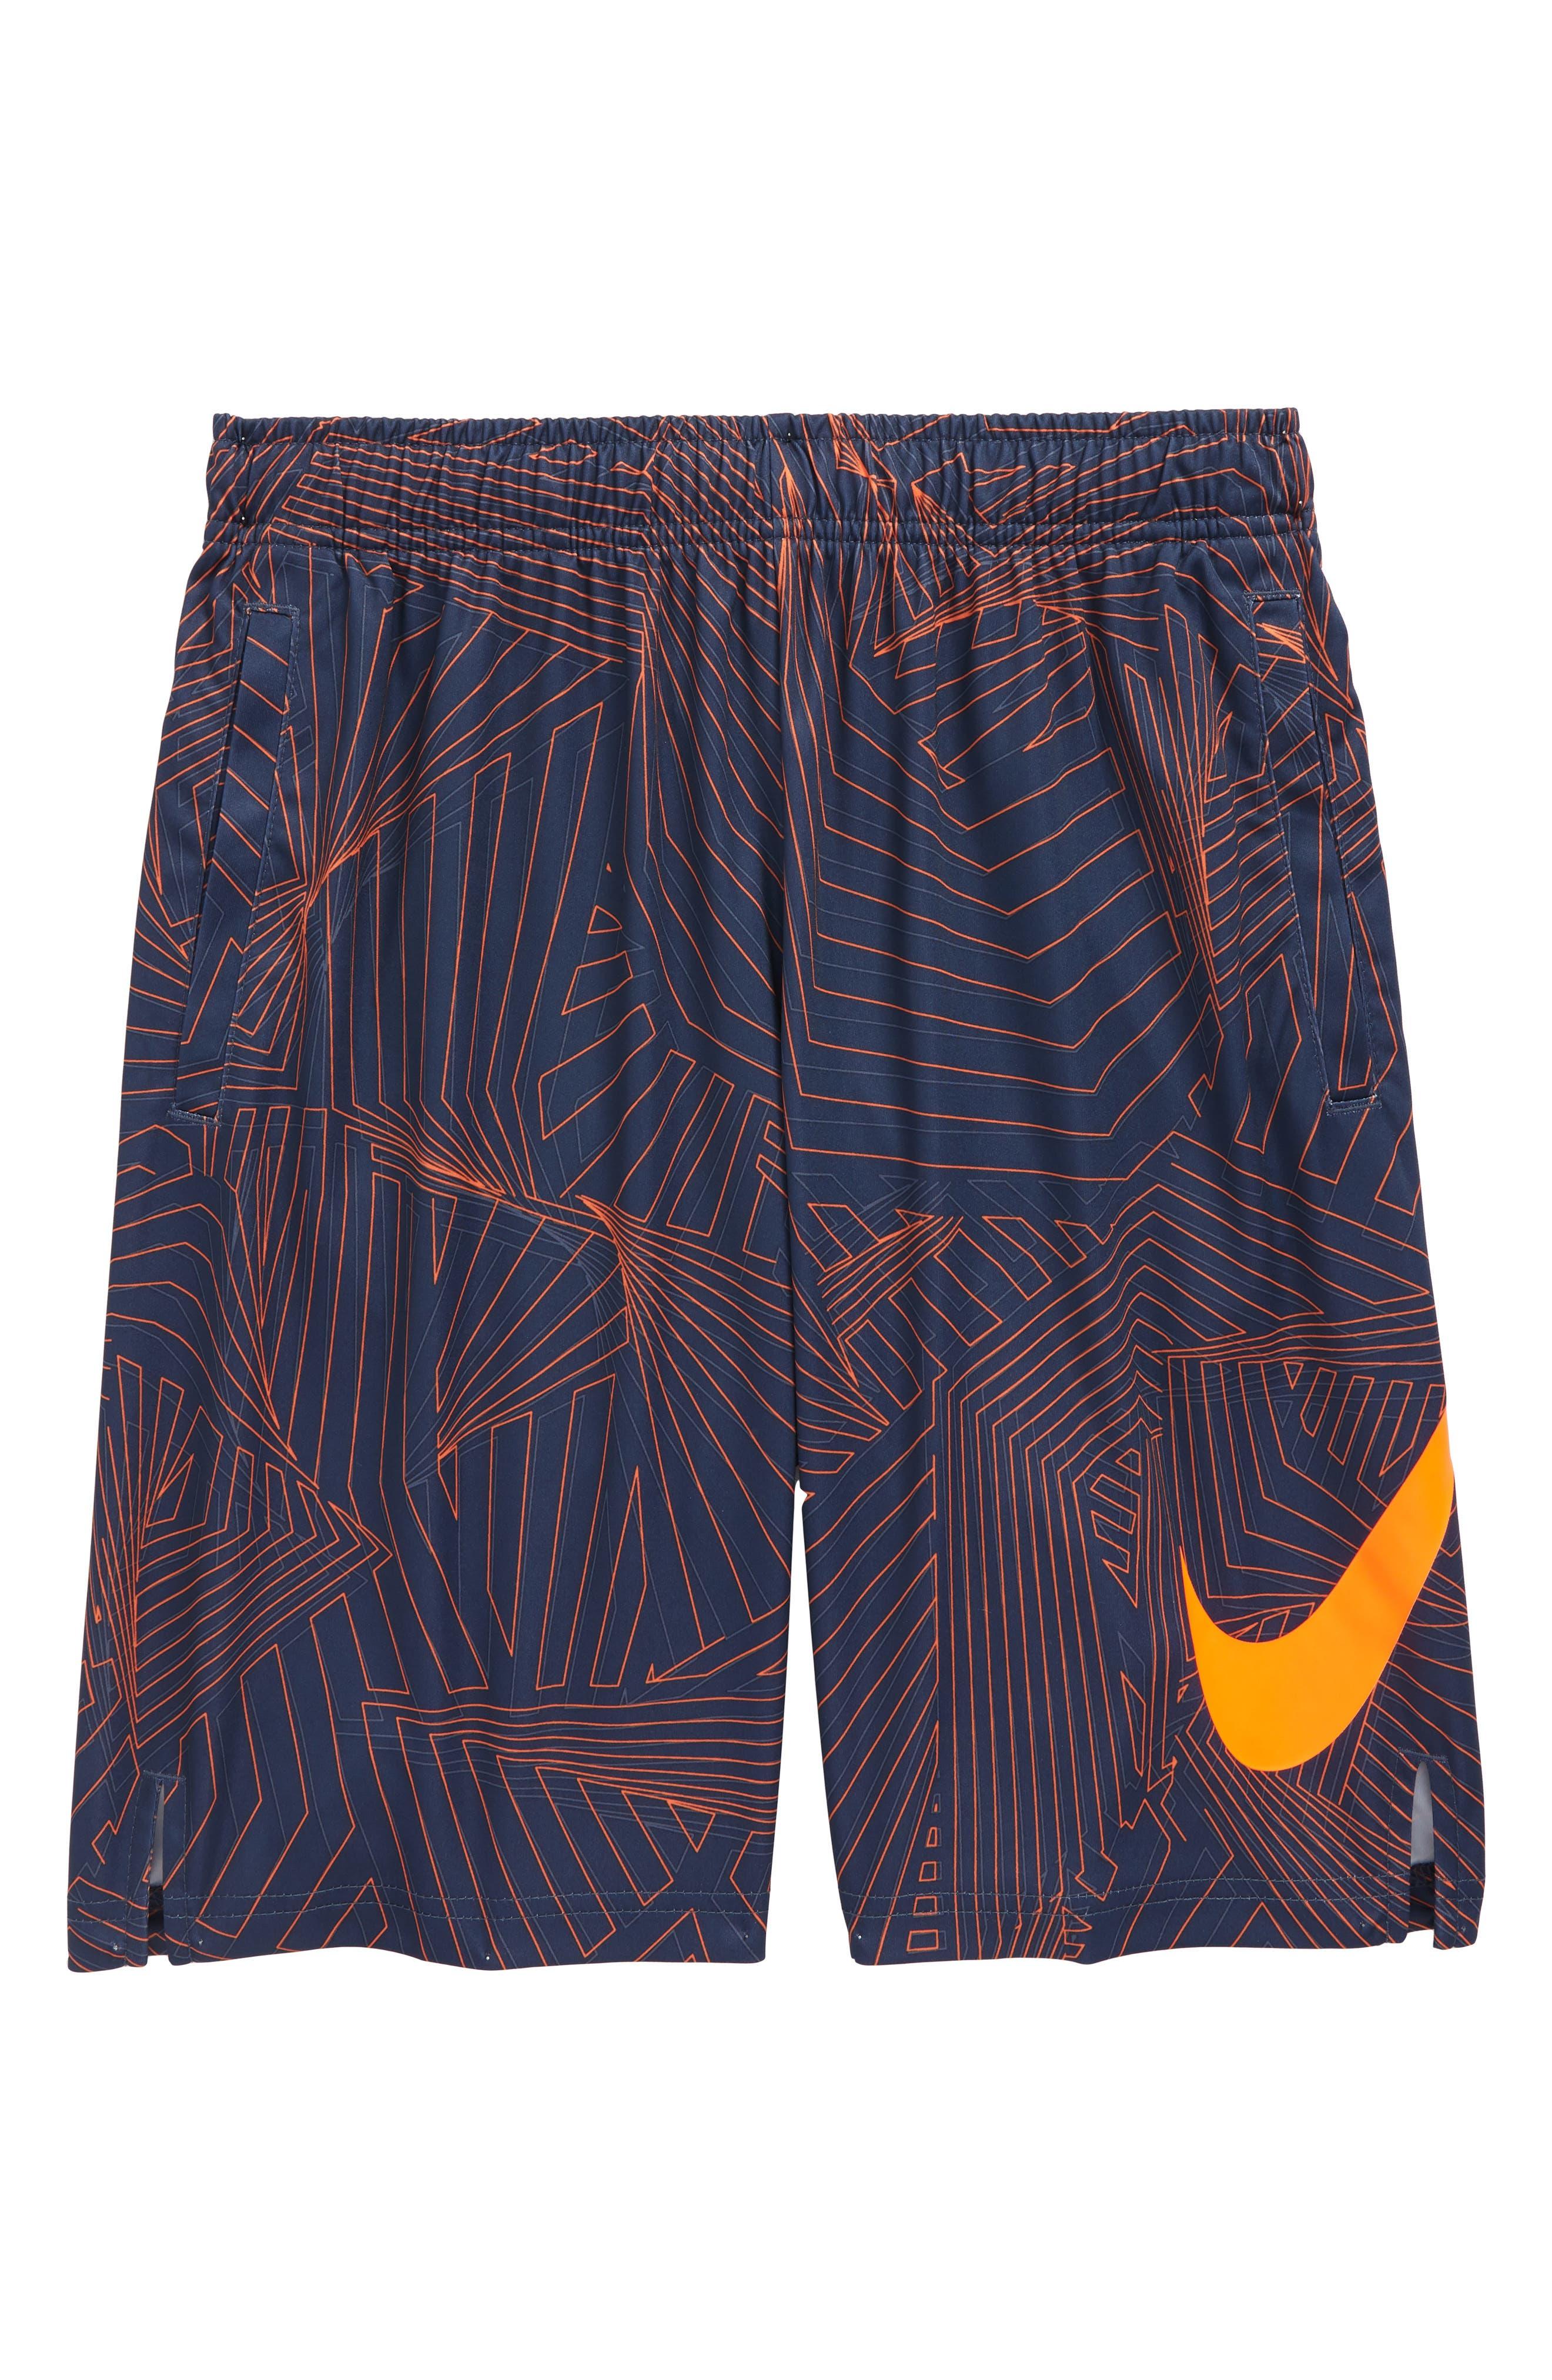 Dry Training Shorts,                             Main thumbnail 3, color,